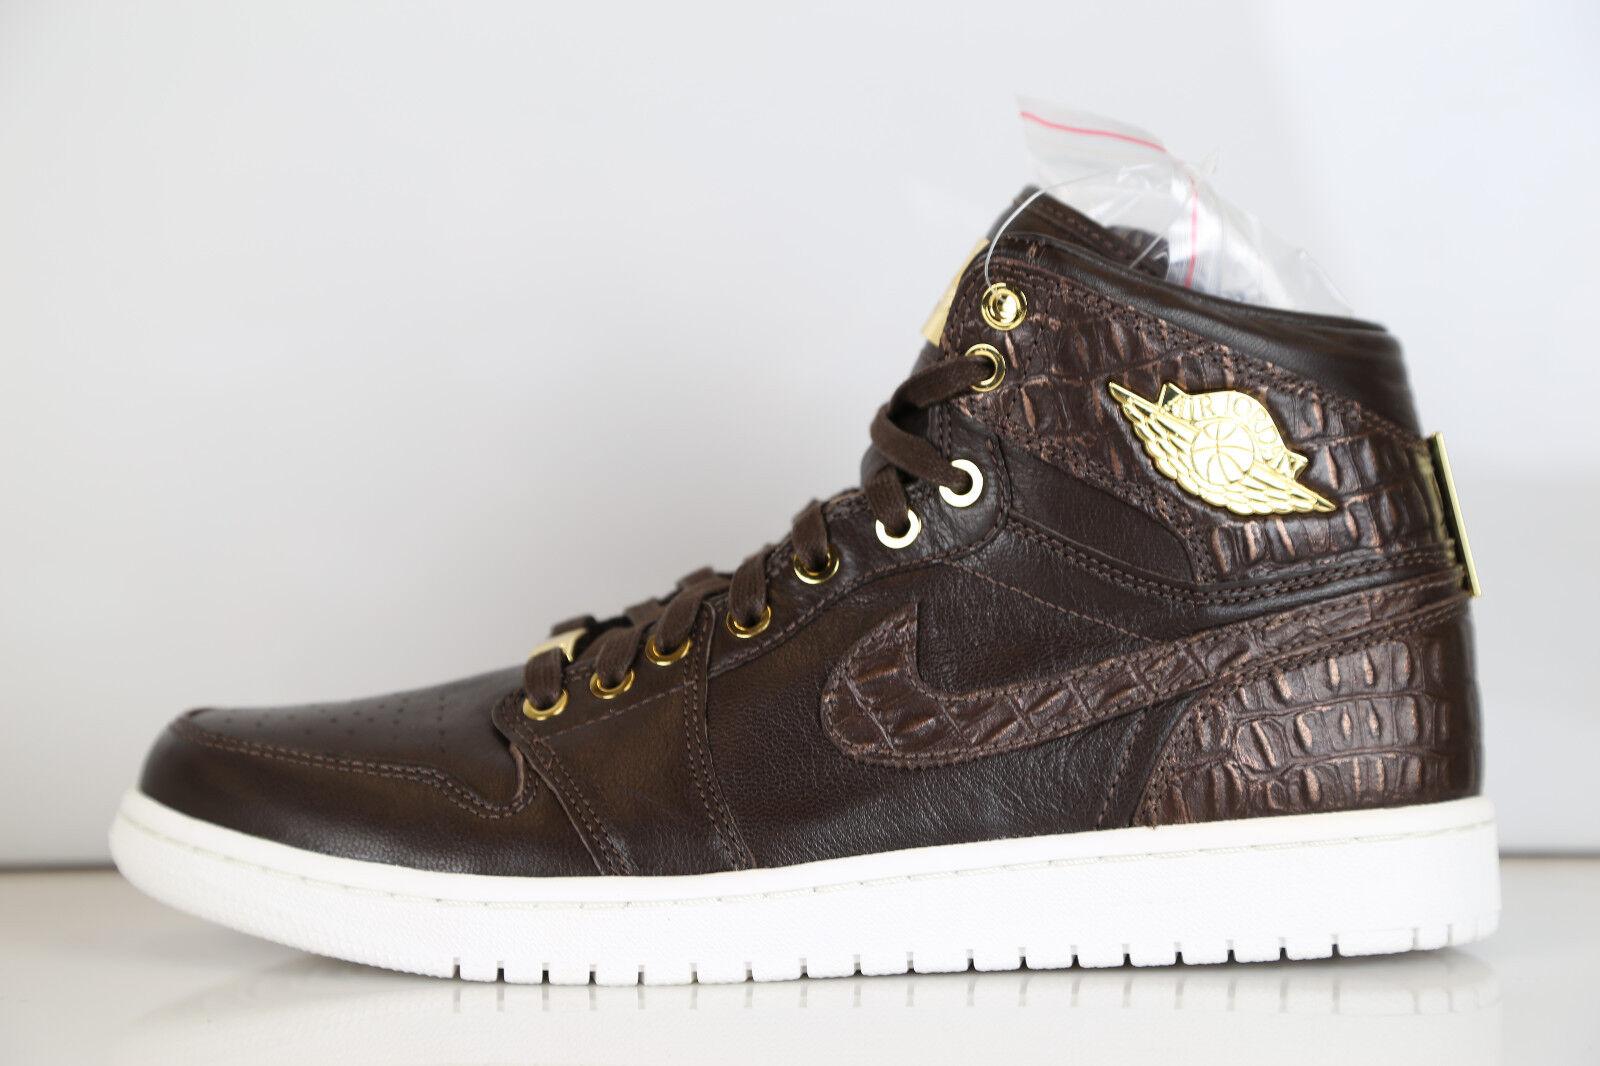 Air Jordan 1 Pinnacle Baroque Brown Croc Metallic Gold 705075-205 8-12 11 4